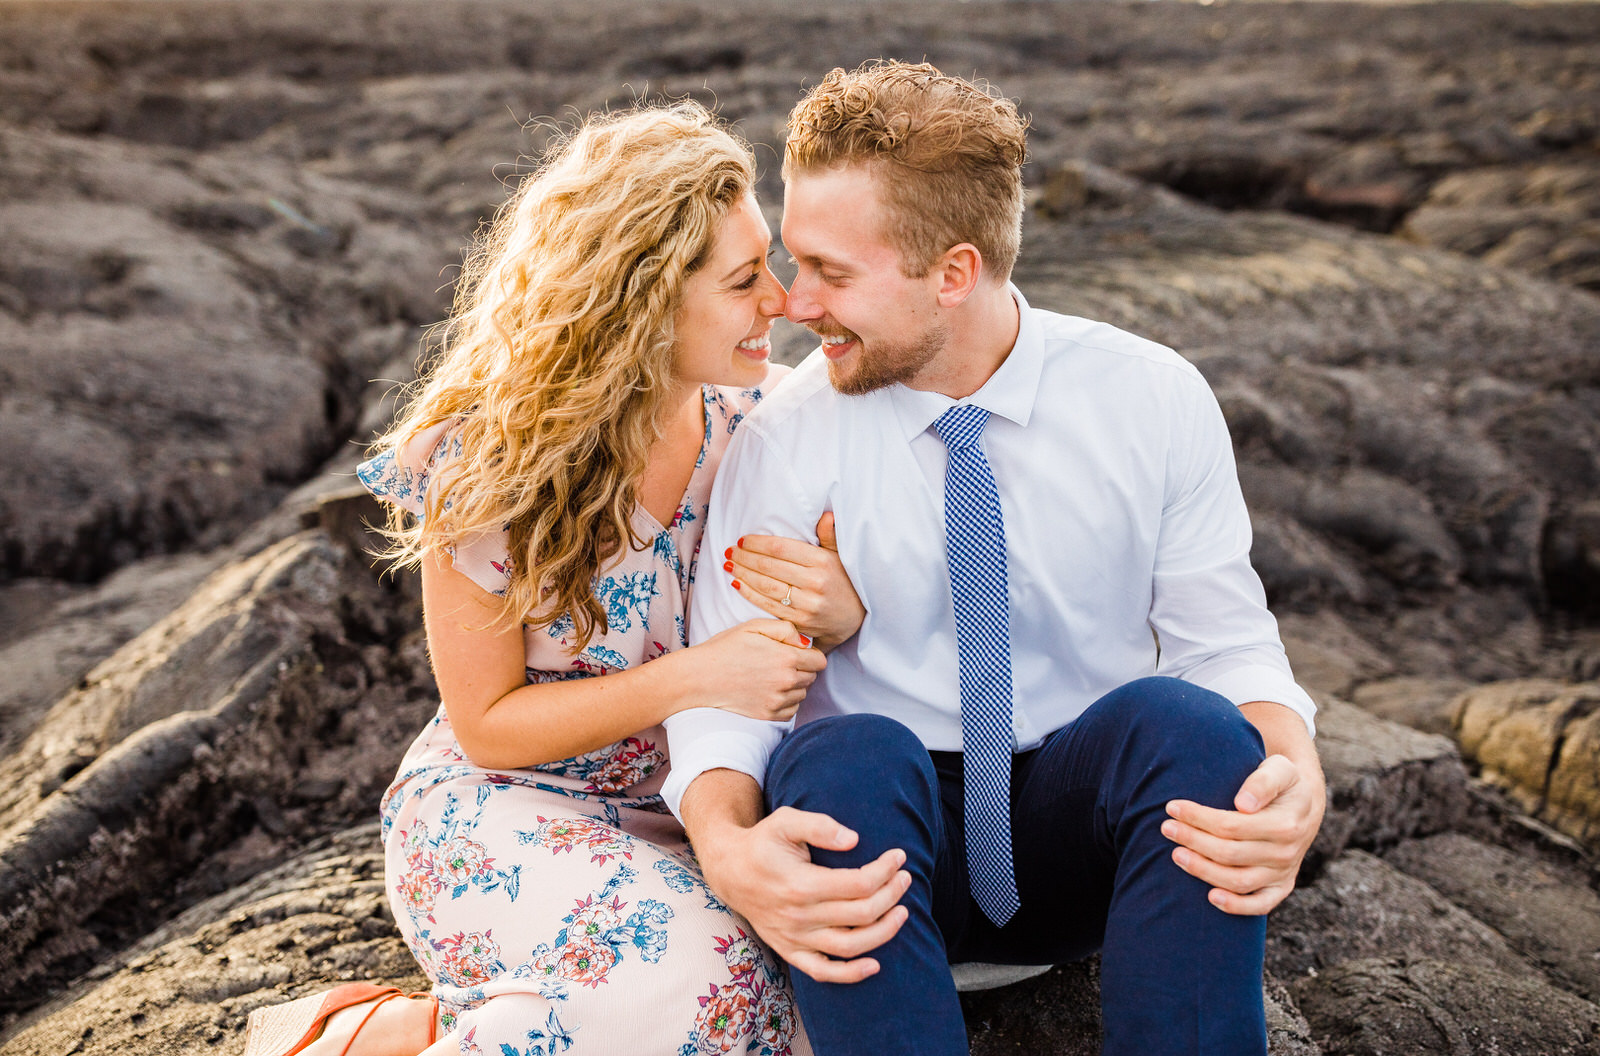 engagements-hilo-happy-couple-big-island-hawaii-10.jpg